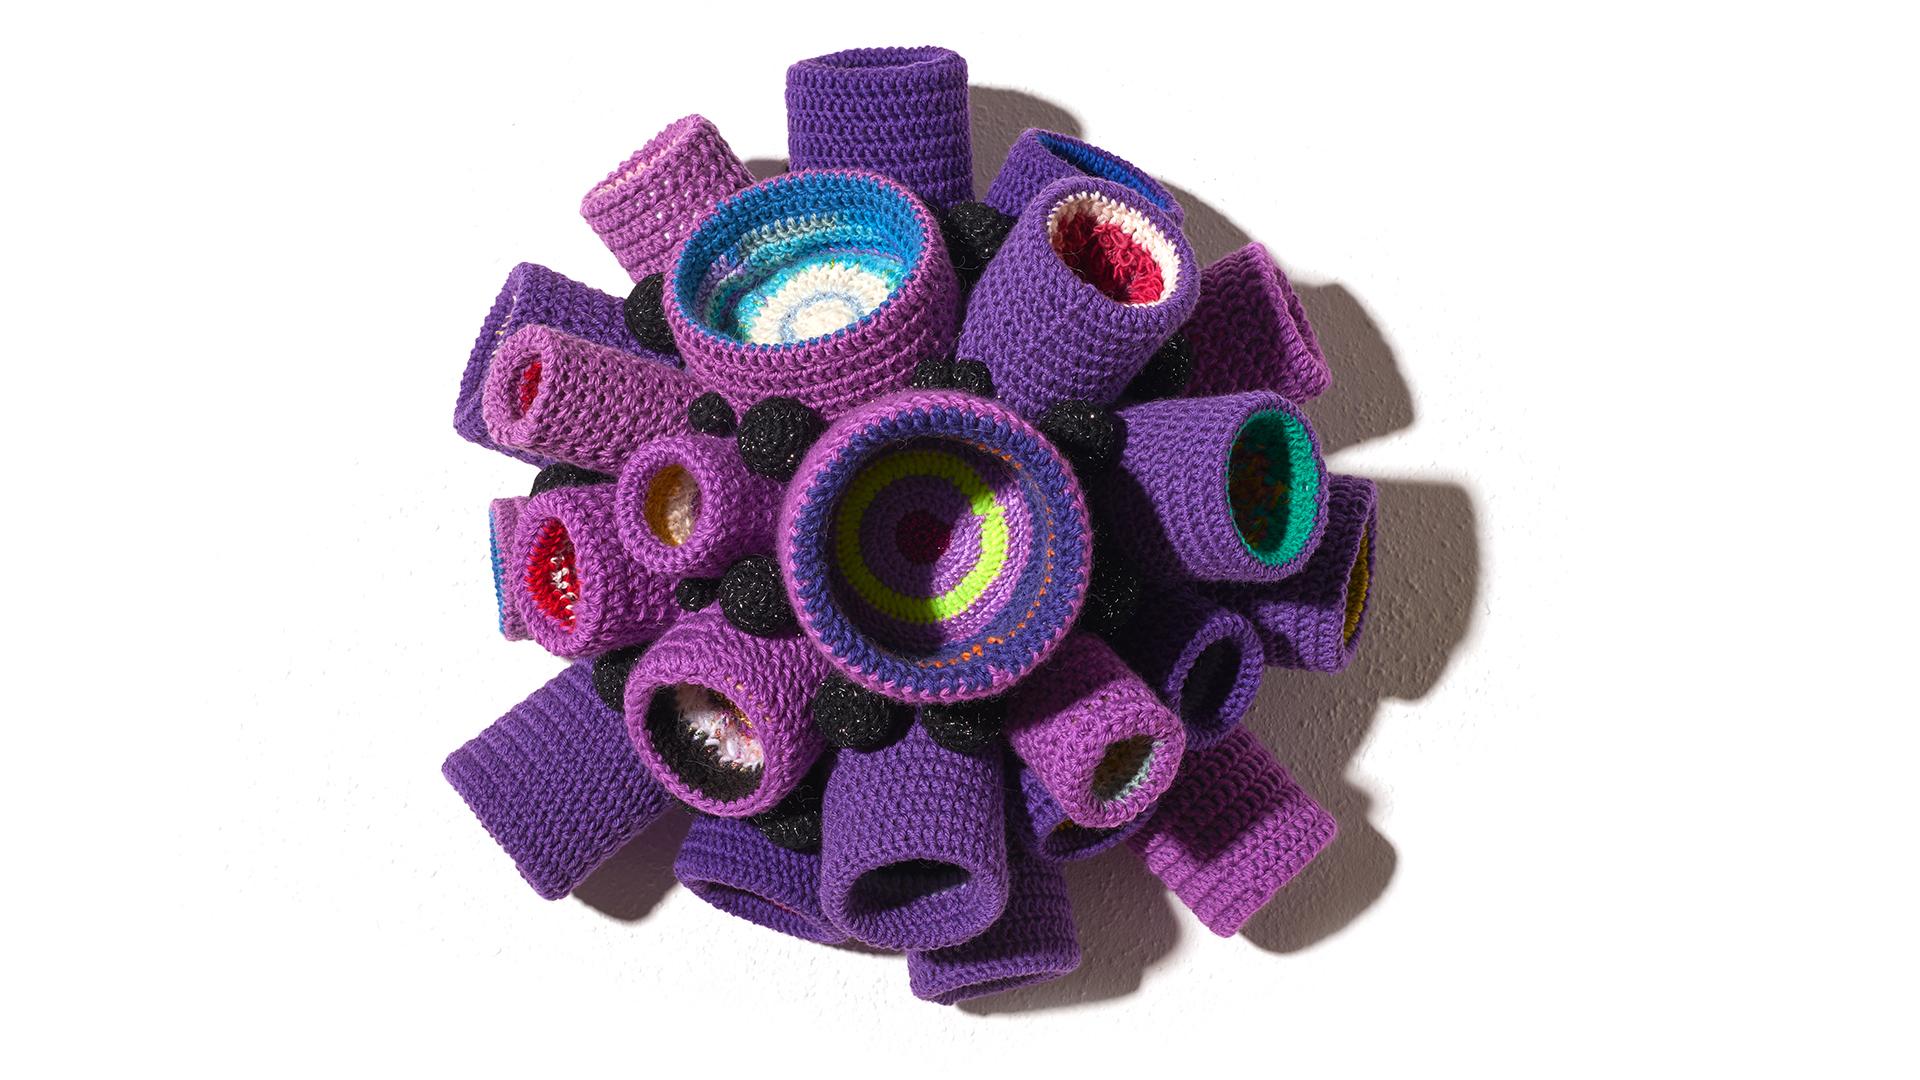 Yarn / Plastic containers / Styrofoam. 2017. 50 x 50 x 50 cm each.